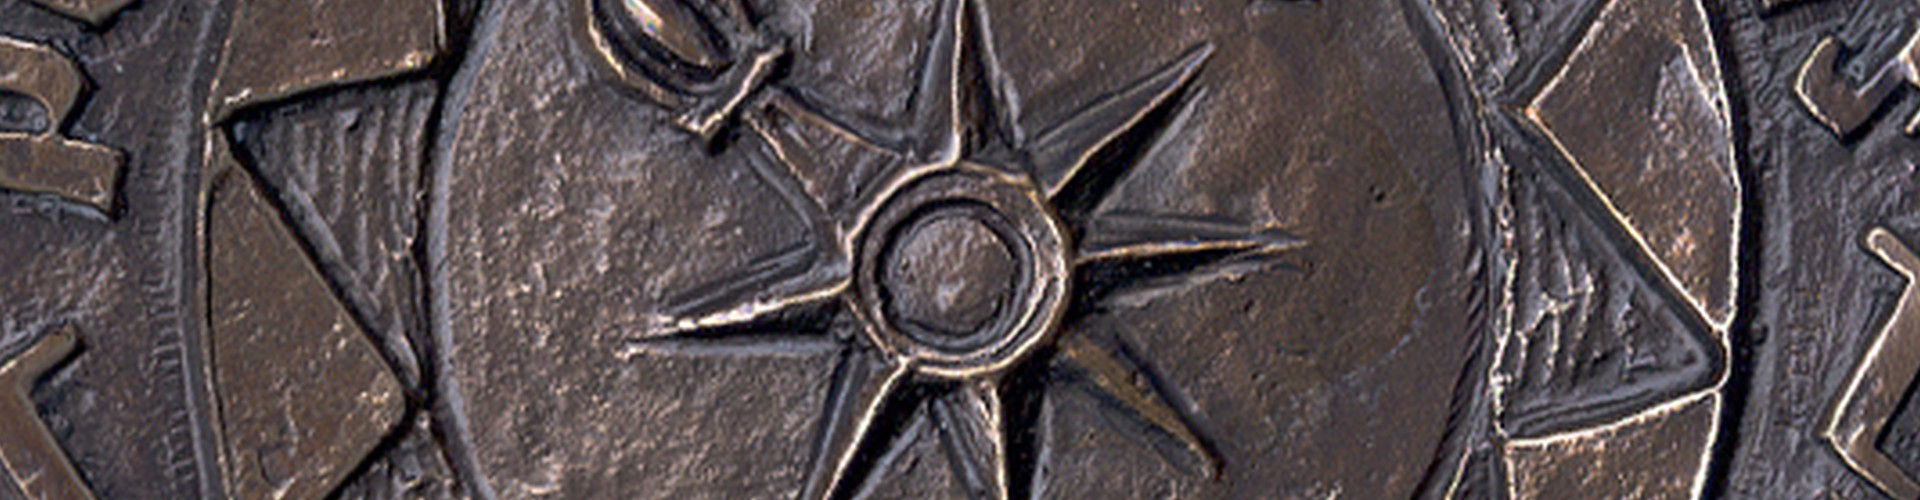 petrus_peregrinus_medal_large.jpg